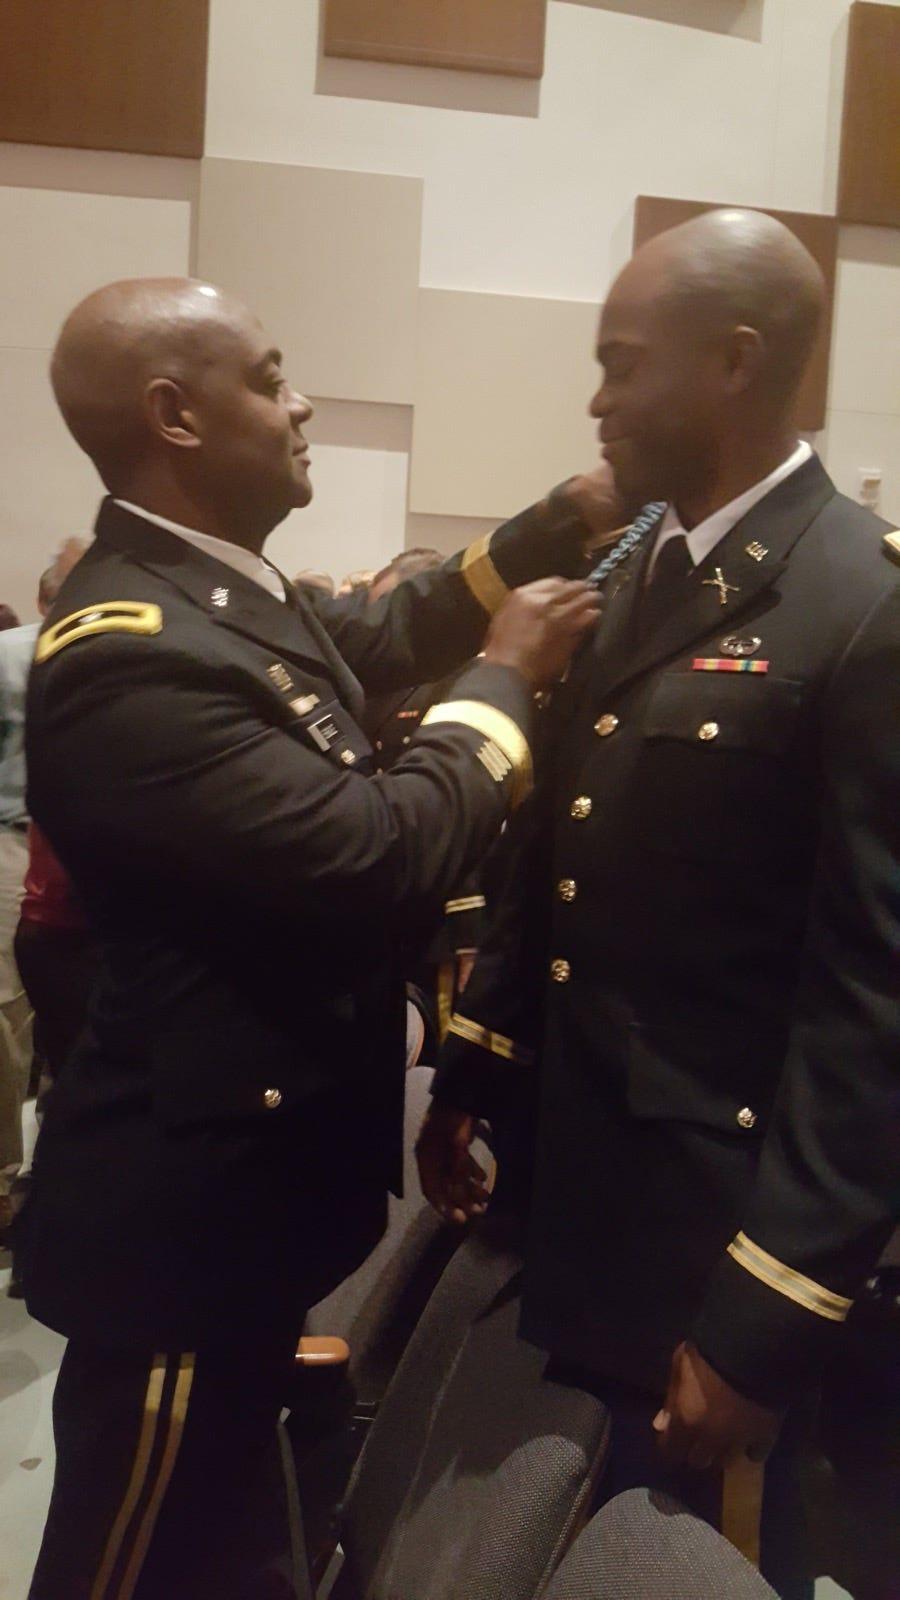 Brig. Gen. Milford Beagle's son 1st Lt. Jordan Beagle accepted an infantry assignment.